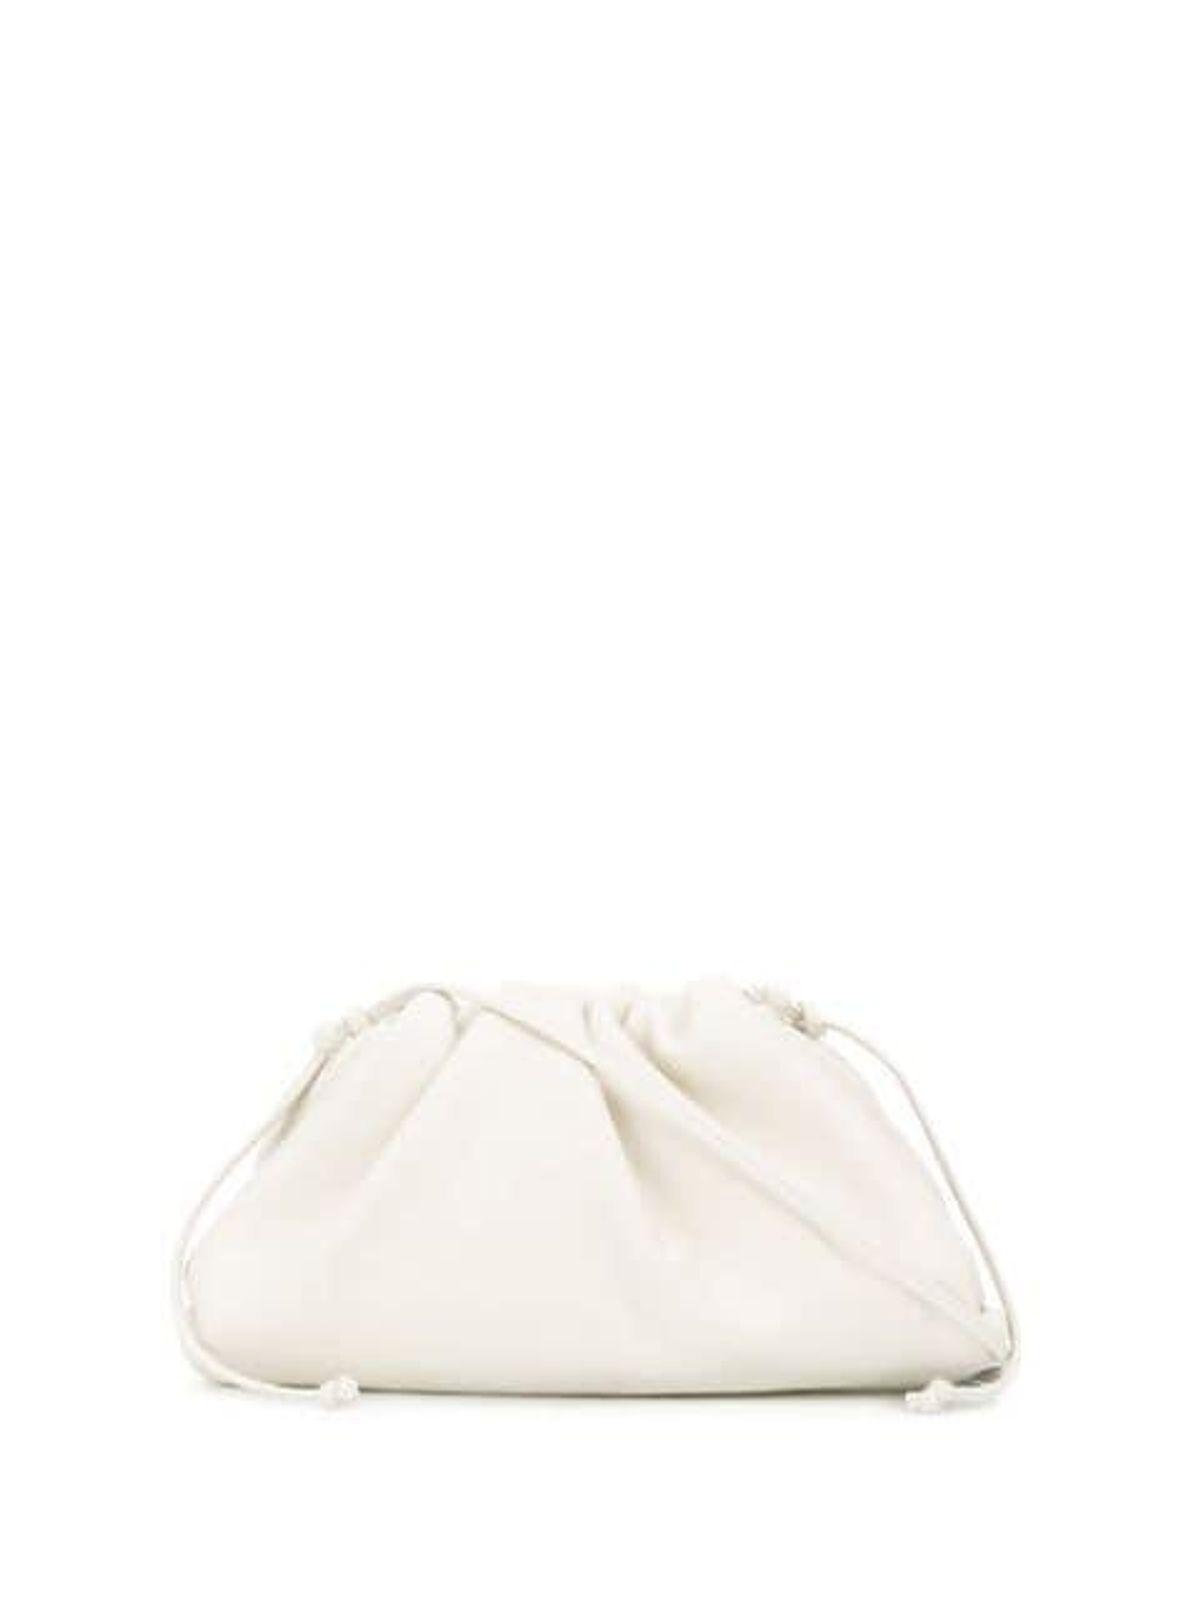 The Mini Pouch Bag